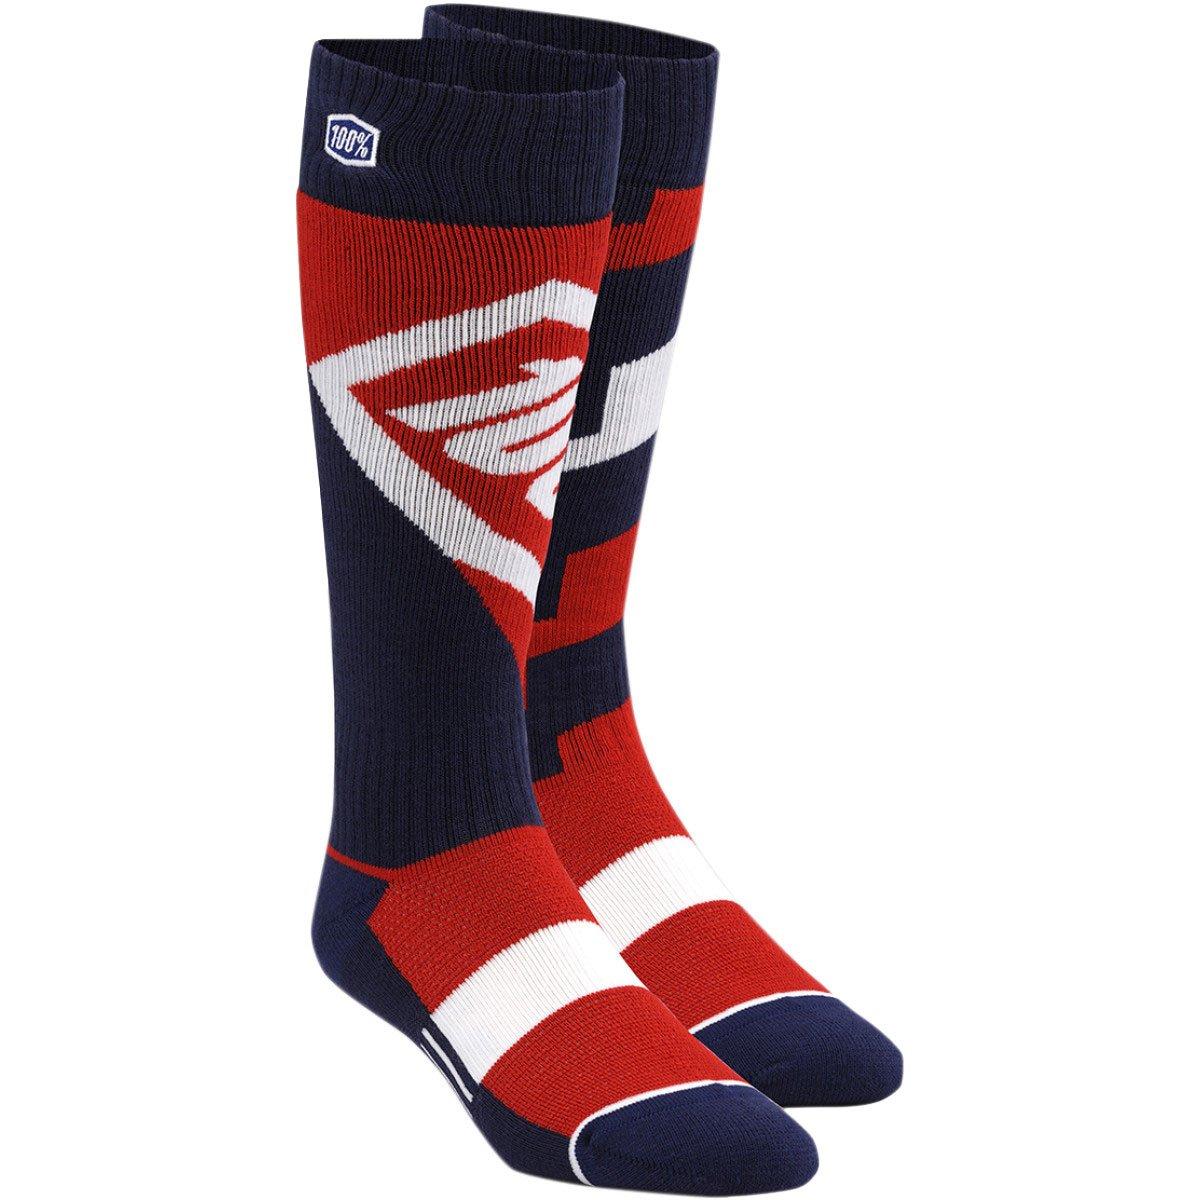 100% 24107-003-18 Unisex-Child Youth Torque 8'' Mid Calf Riding Socks (Black,Large/X-Large)